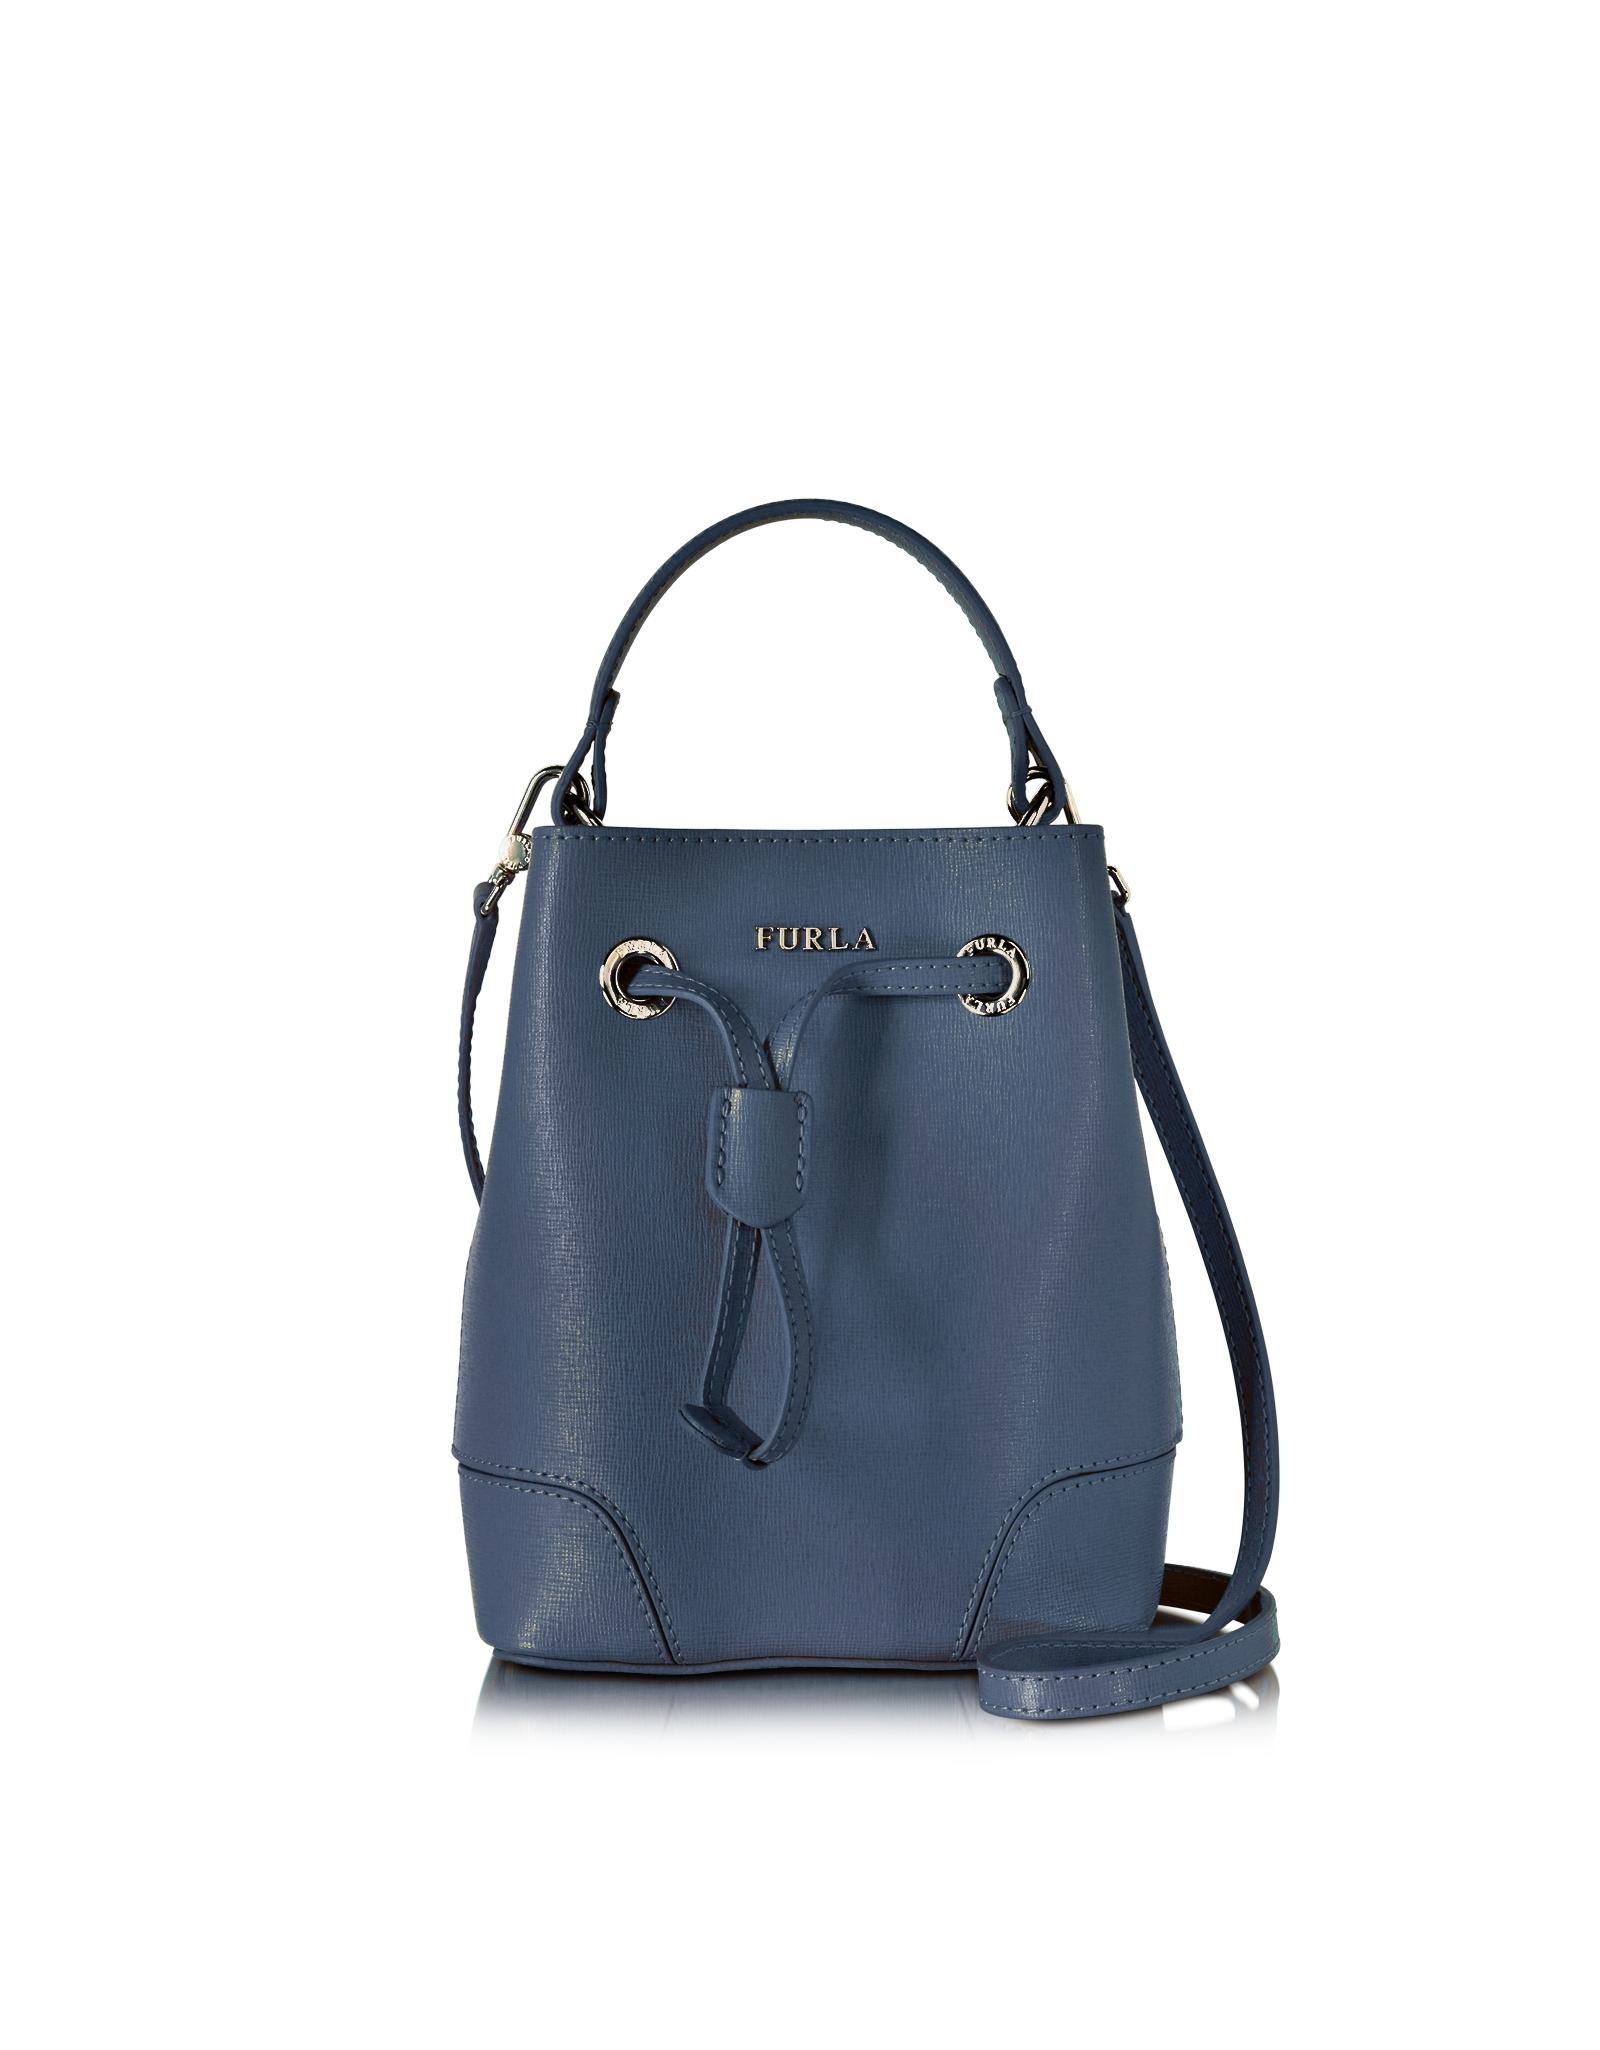 Navy blue crossbody handbag all discount luggage